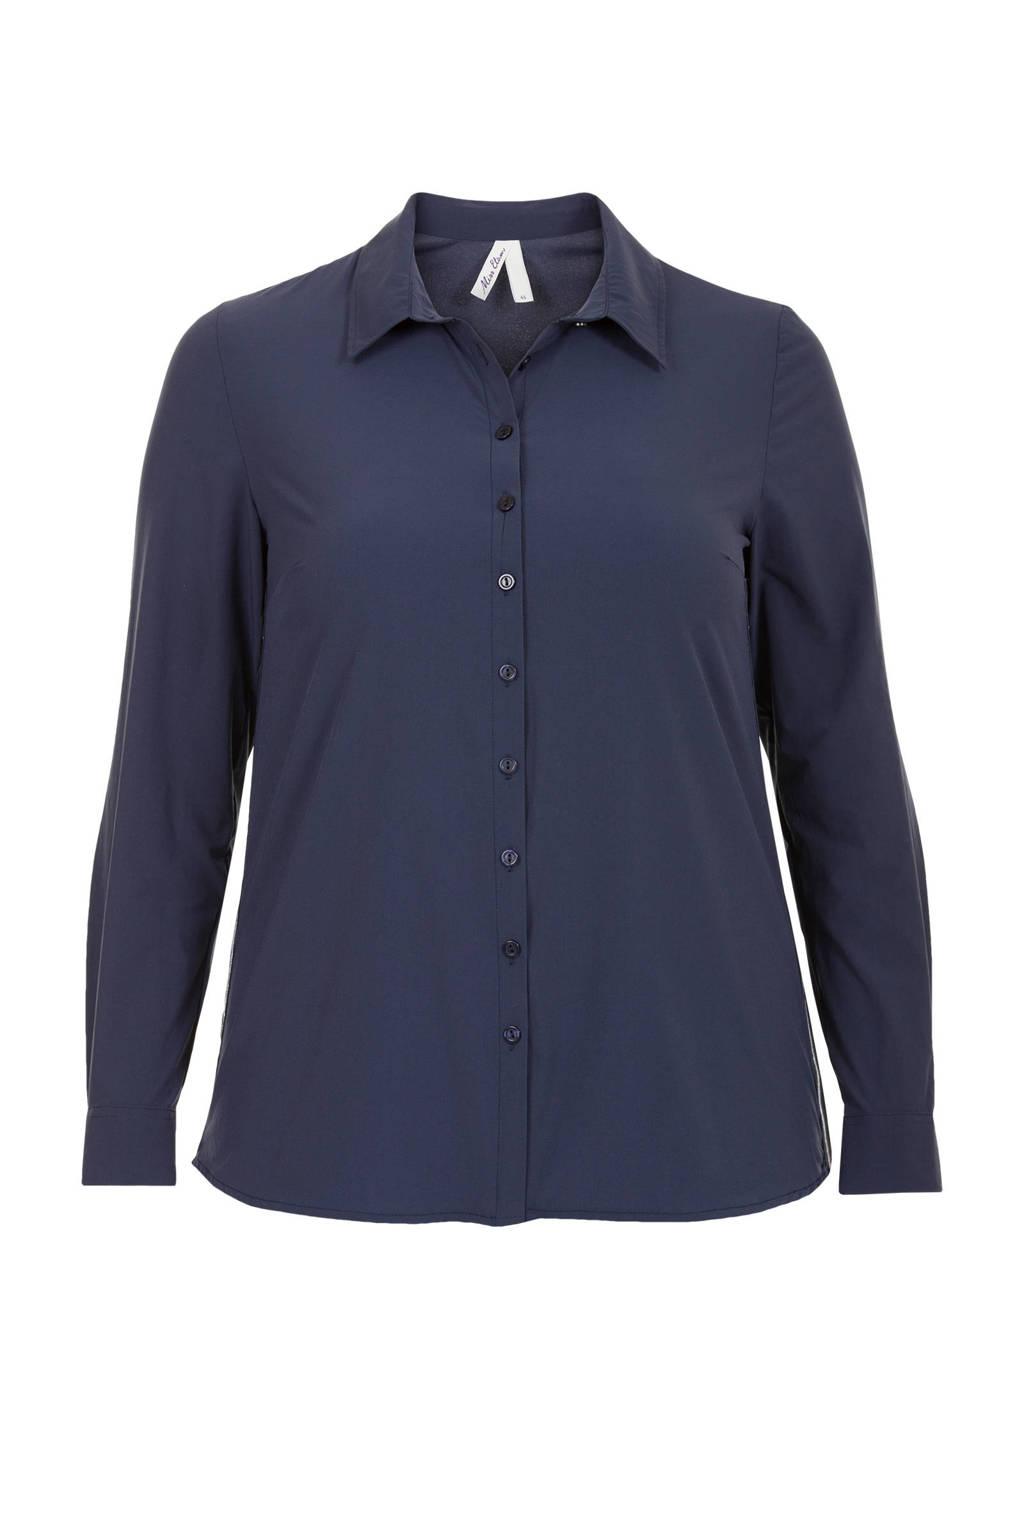 Miss Etam Plus overhemdblouse blauw, Blauw